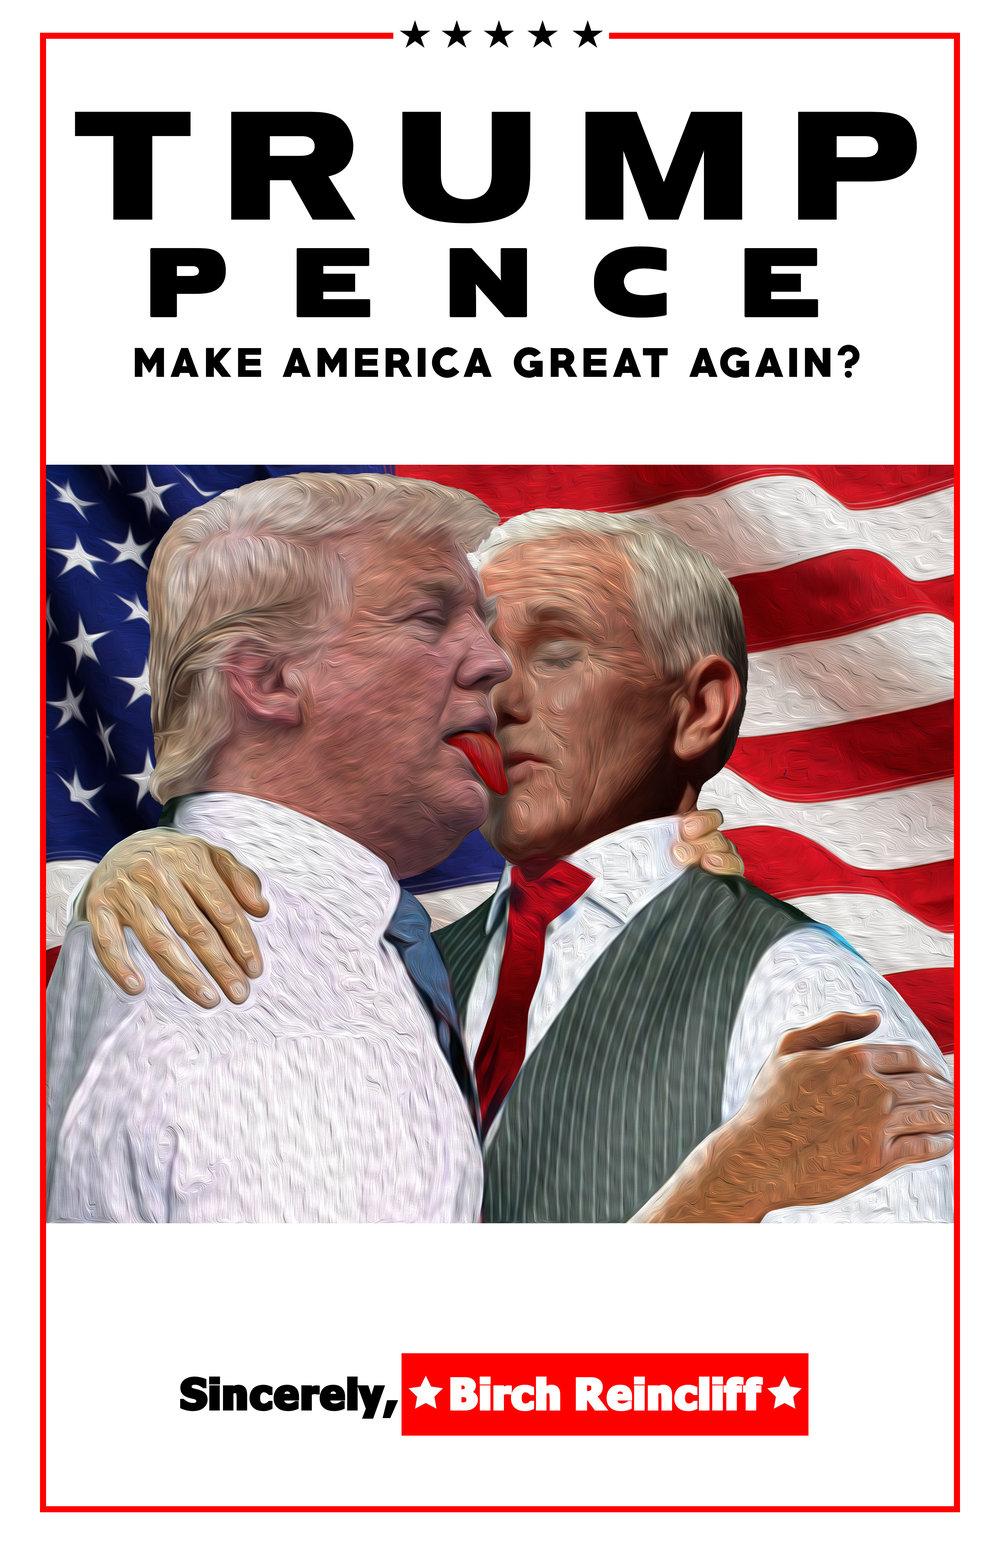 An American Love Story Donald Trump Donnie The Poo 2016 Propoganda Birch Reincliff Golden Toilet Golden Elephant 2 street art illegal advertising political art 2 Trump Pence Kissing Gay 2 Poster